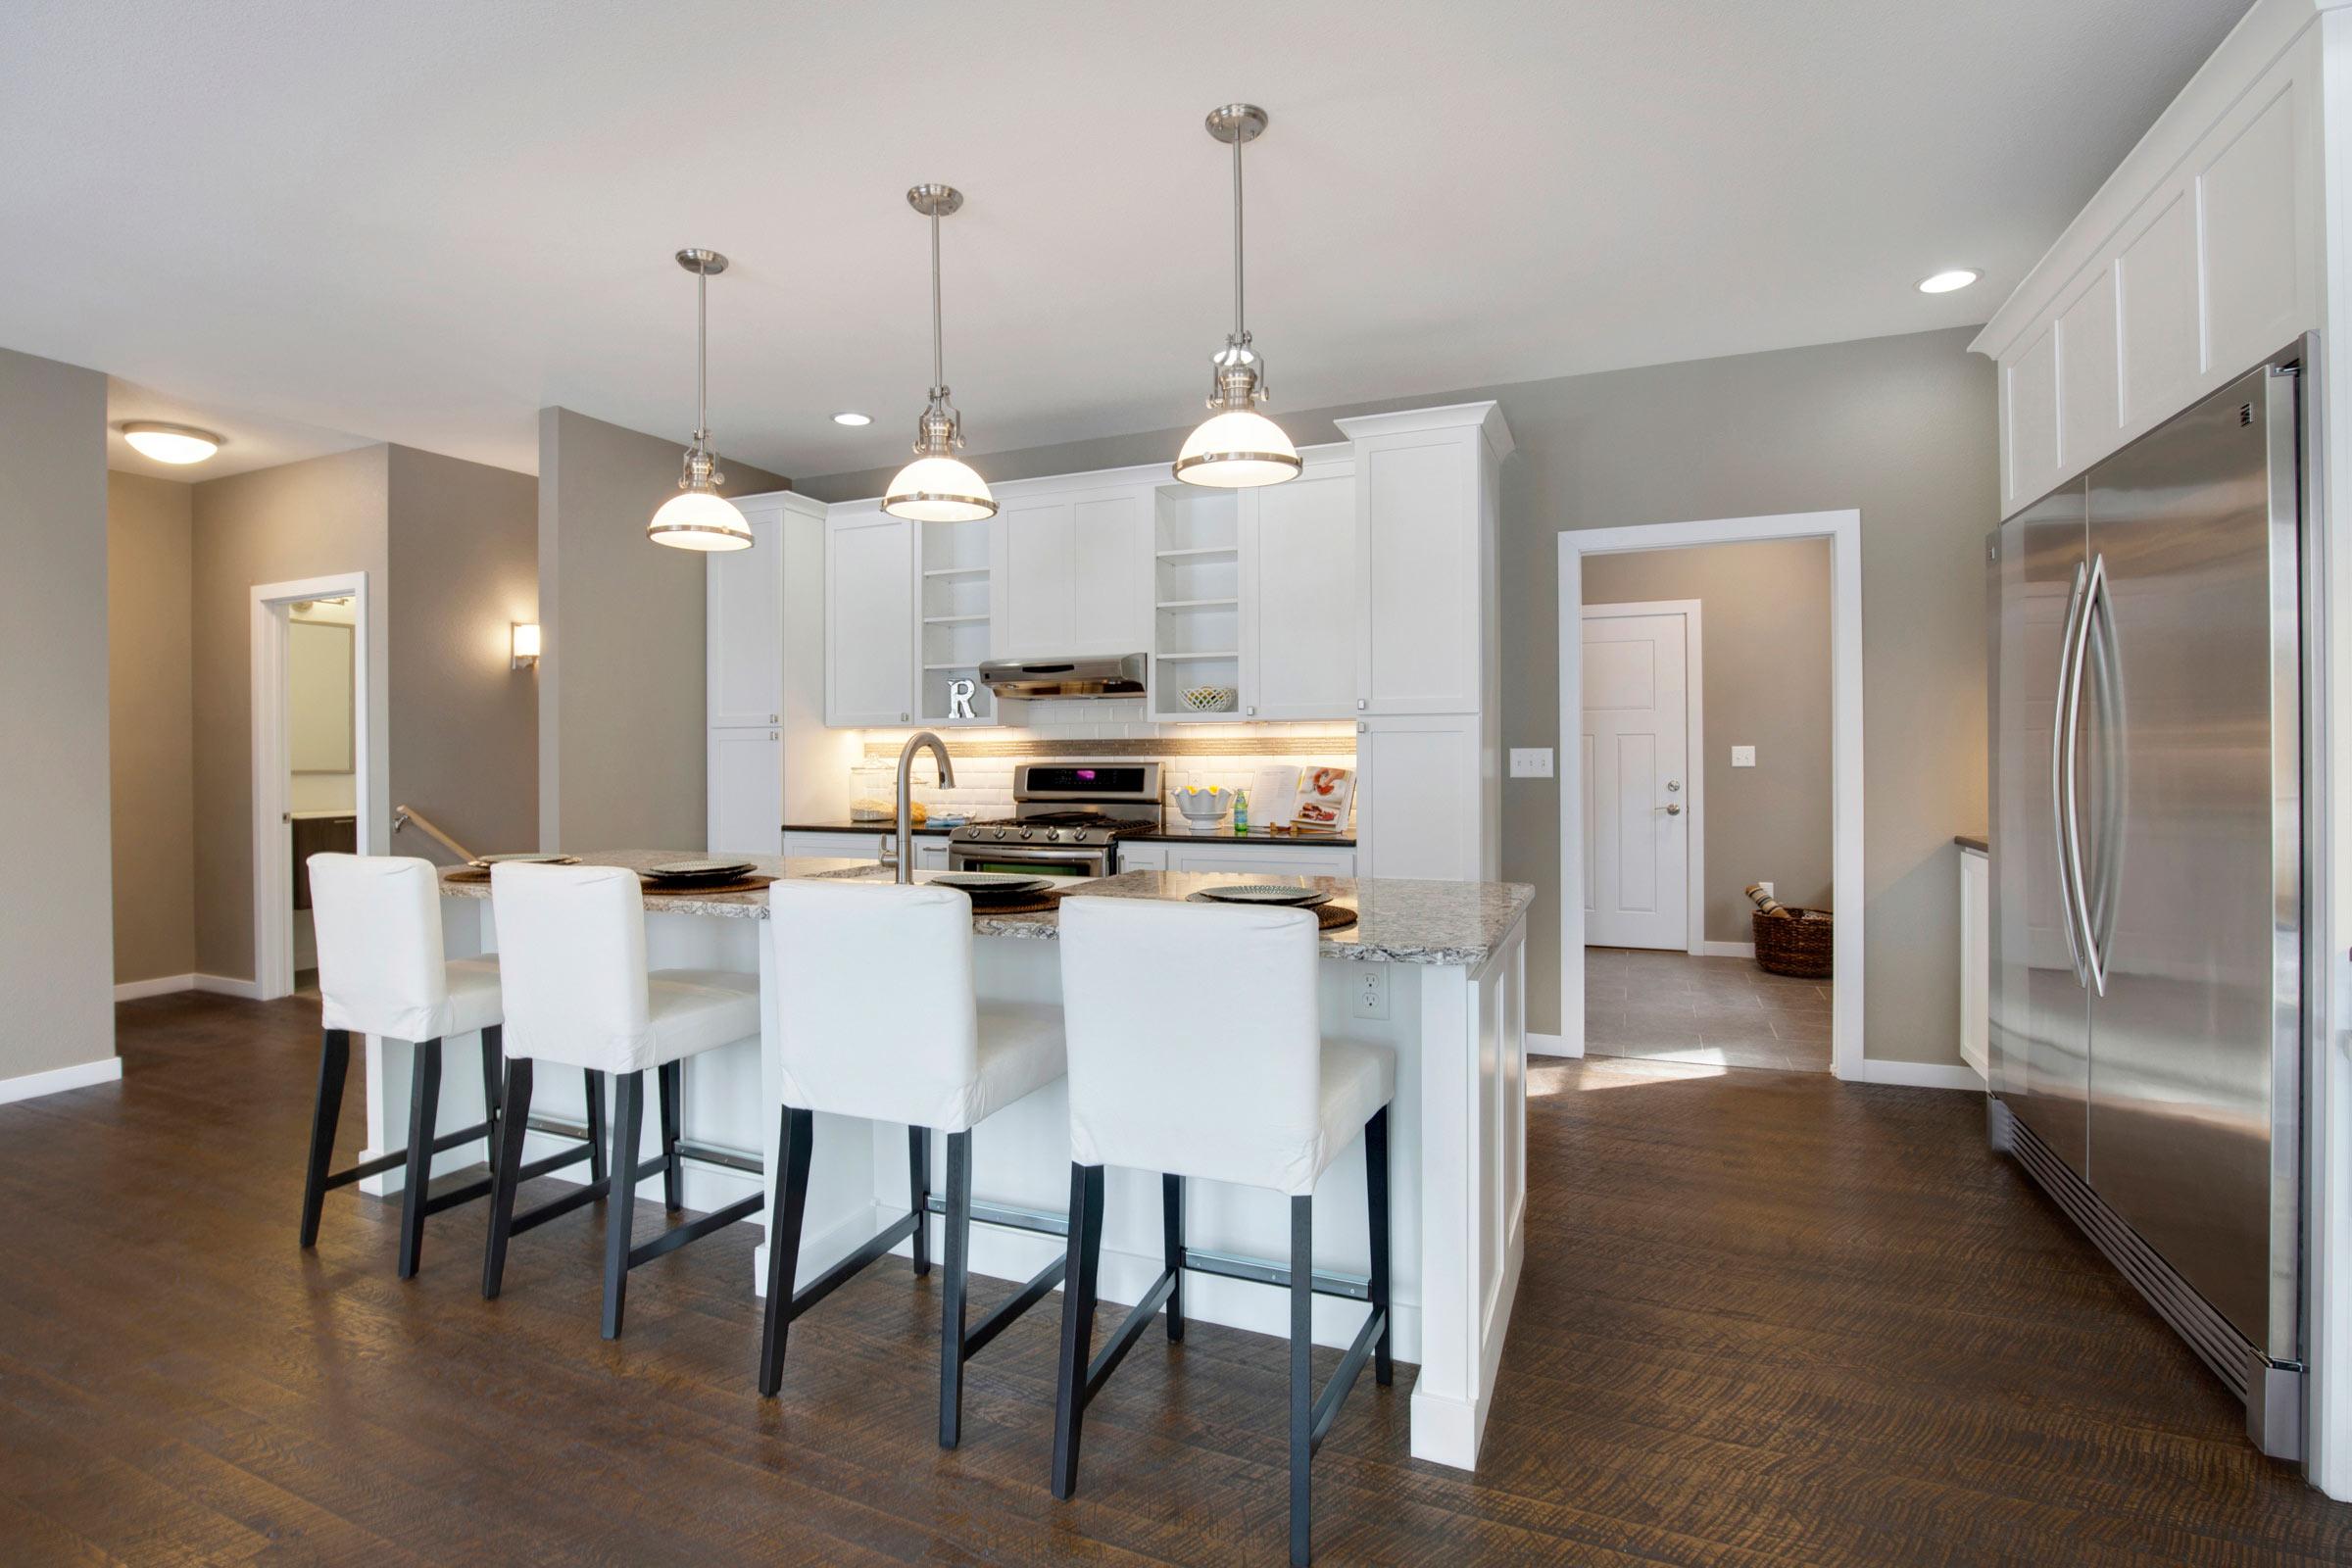 Maven Design Studio Portfolio - Kitchen remodel with dark floors, white cabinets, stainless steel